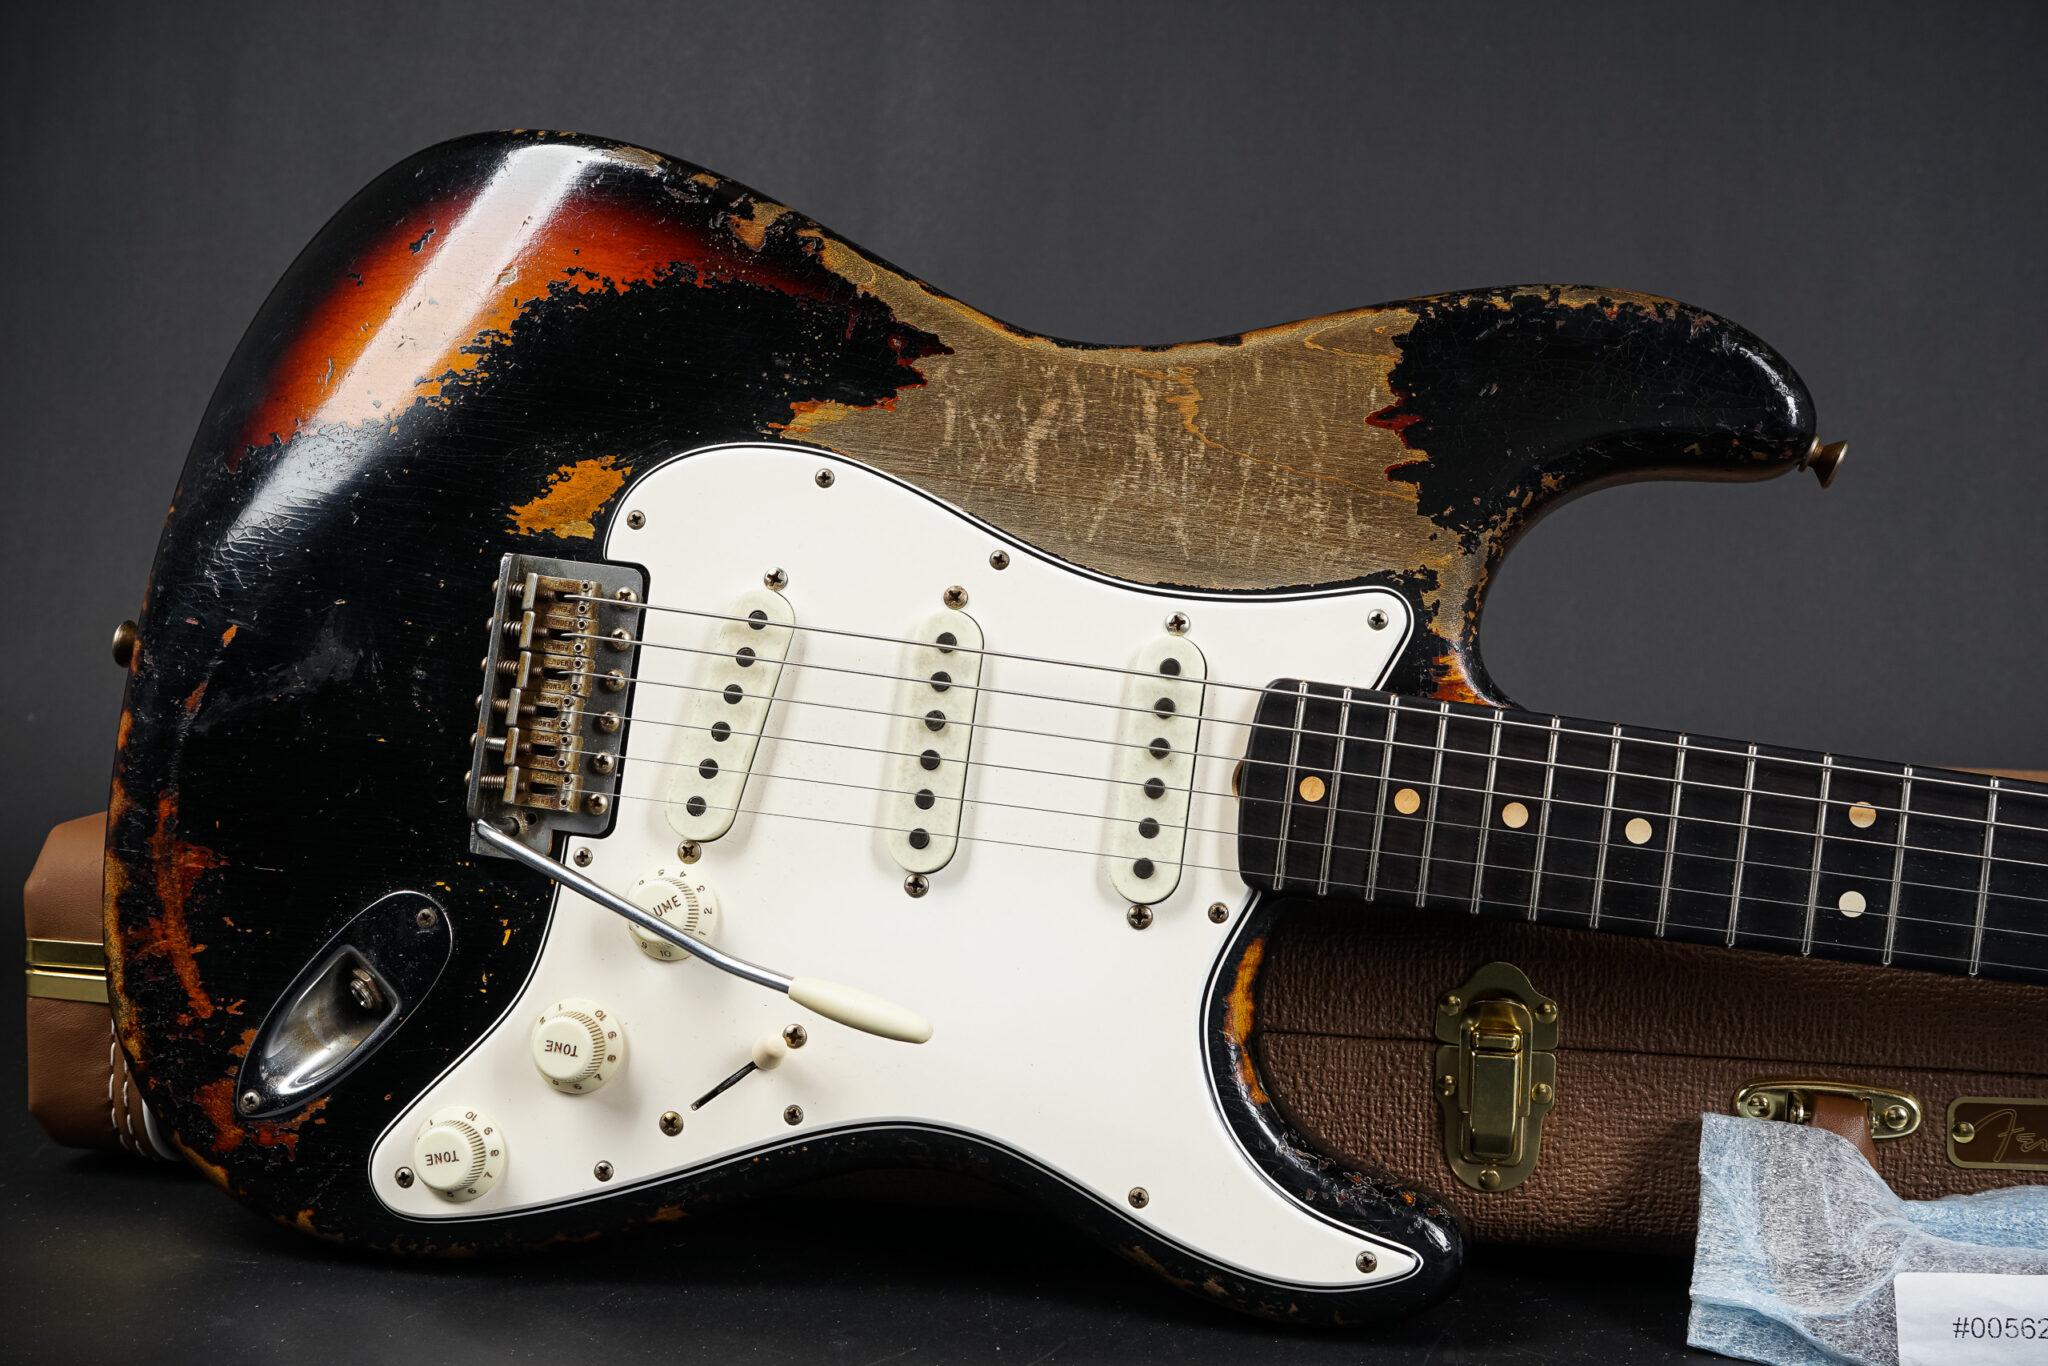 https://guitarpoint.de/app/uploads/products/2021-fender-dale-wilson-masterbuilt-1963-stratocaster-heavy-relic-black-over-sunburst/2021-Fender-Dale-Wilson-Masterbuilt-1963-BlackOverSunburst-CZ549646-8-2048x1366.jpg